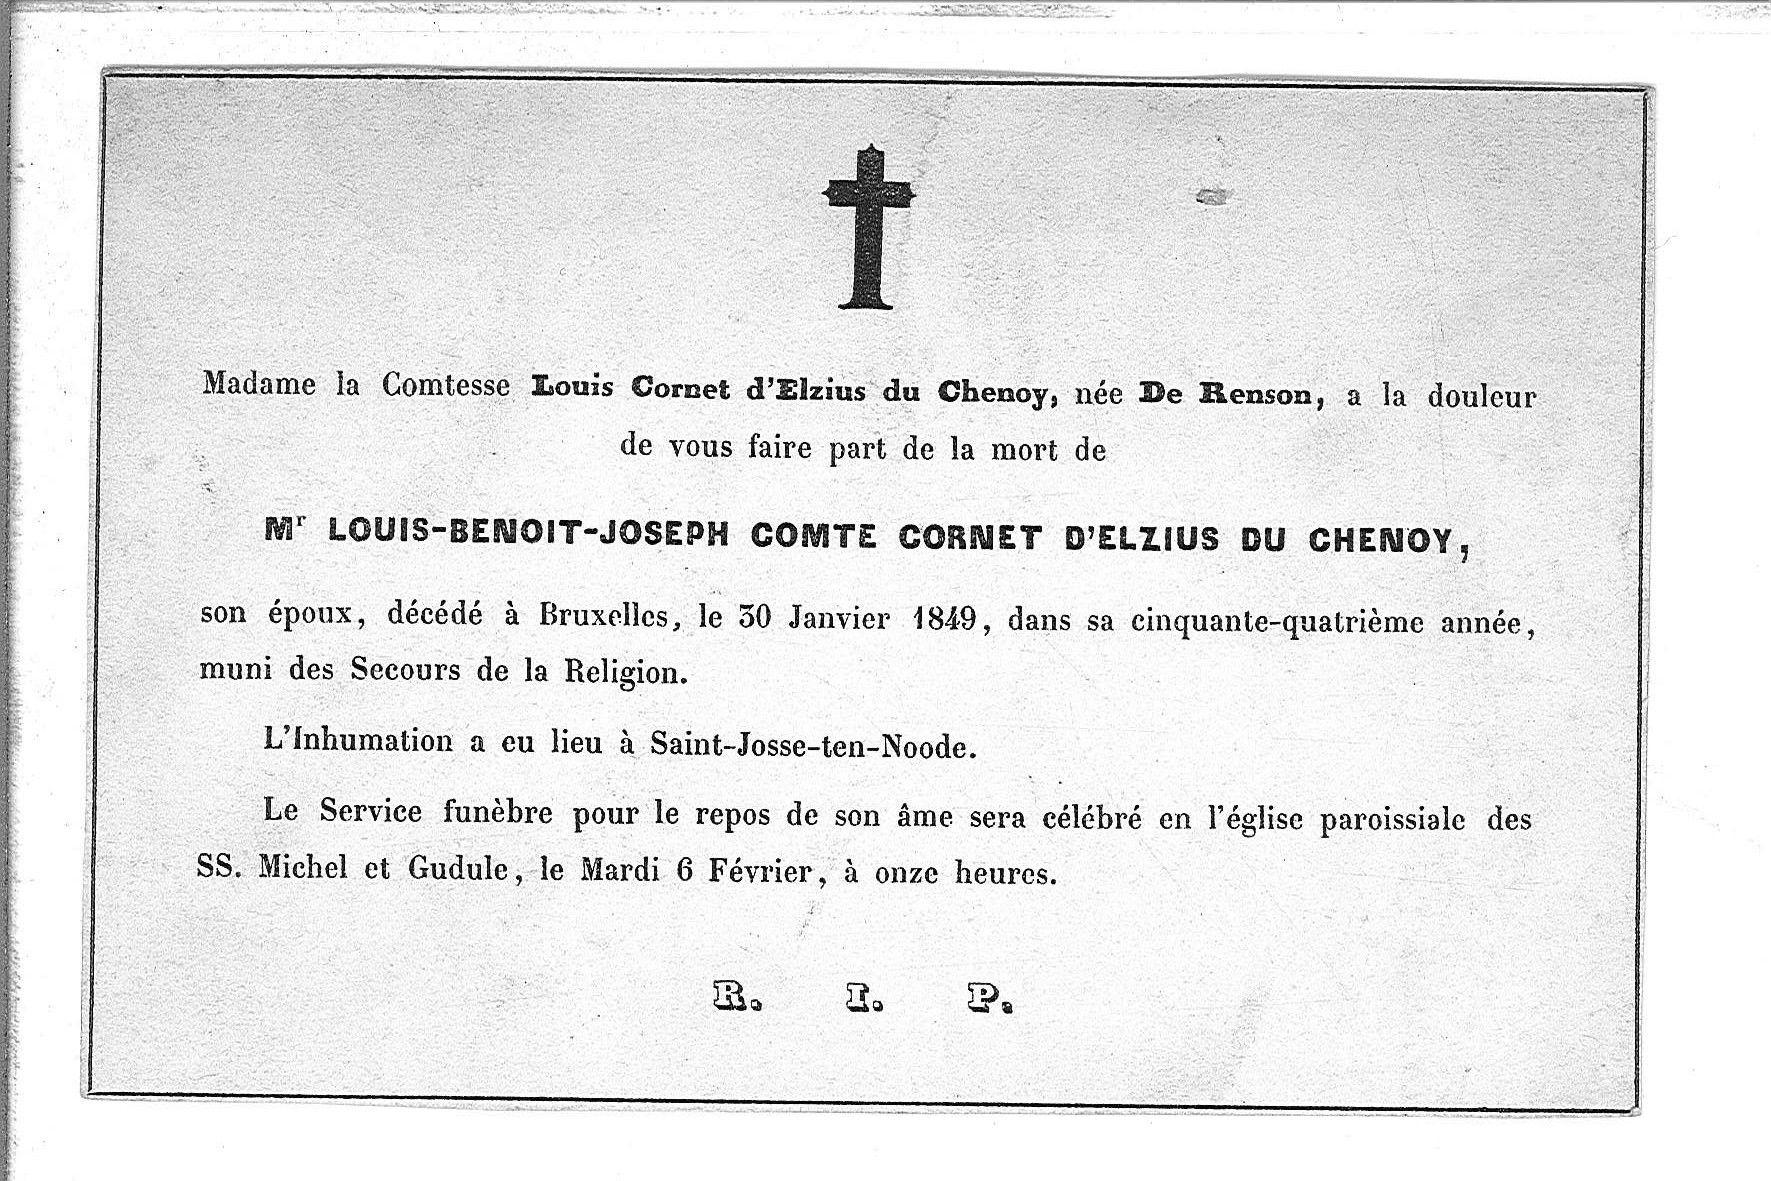 Louis-Benoit-Joseph-(1849)-20121031134623_00025.jpg